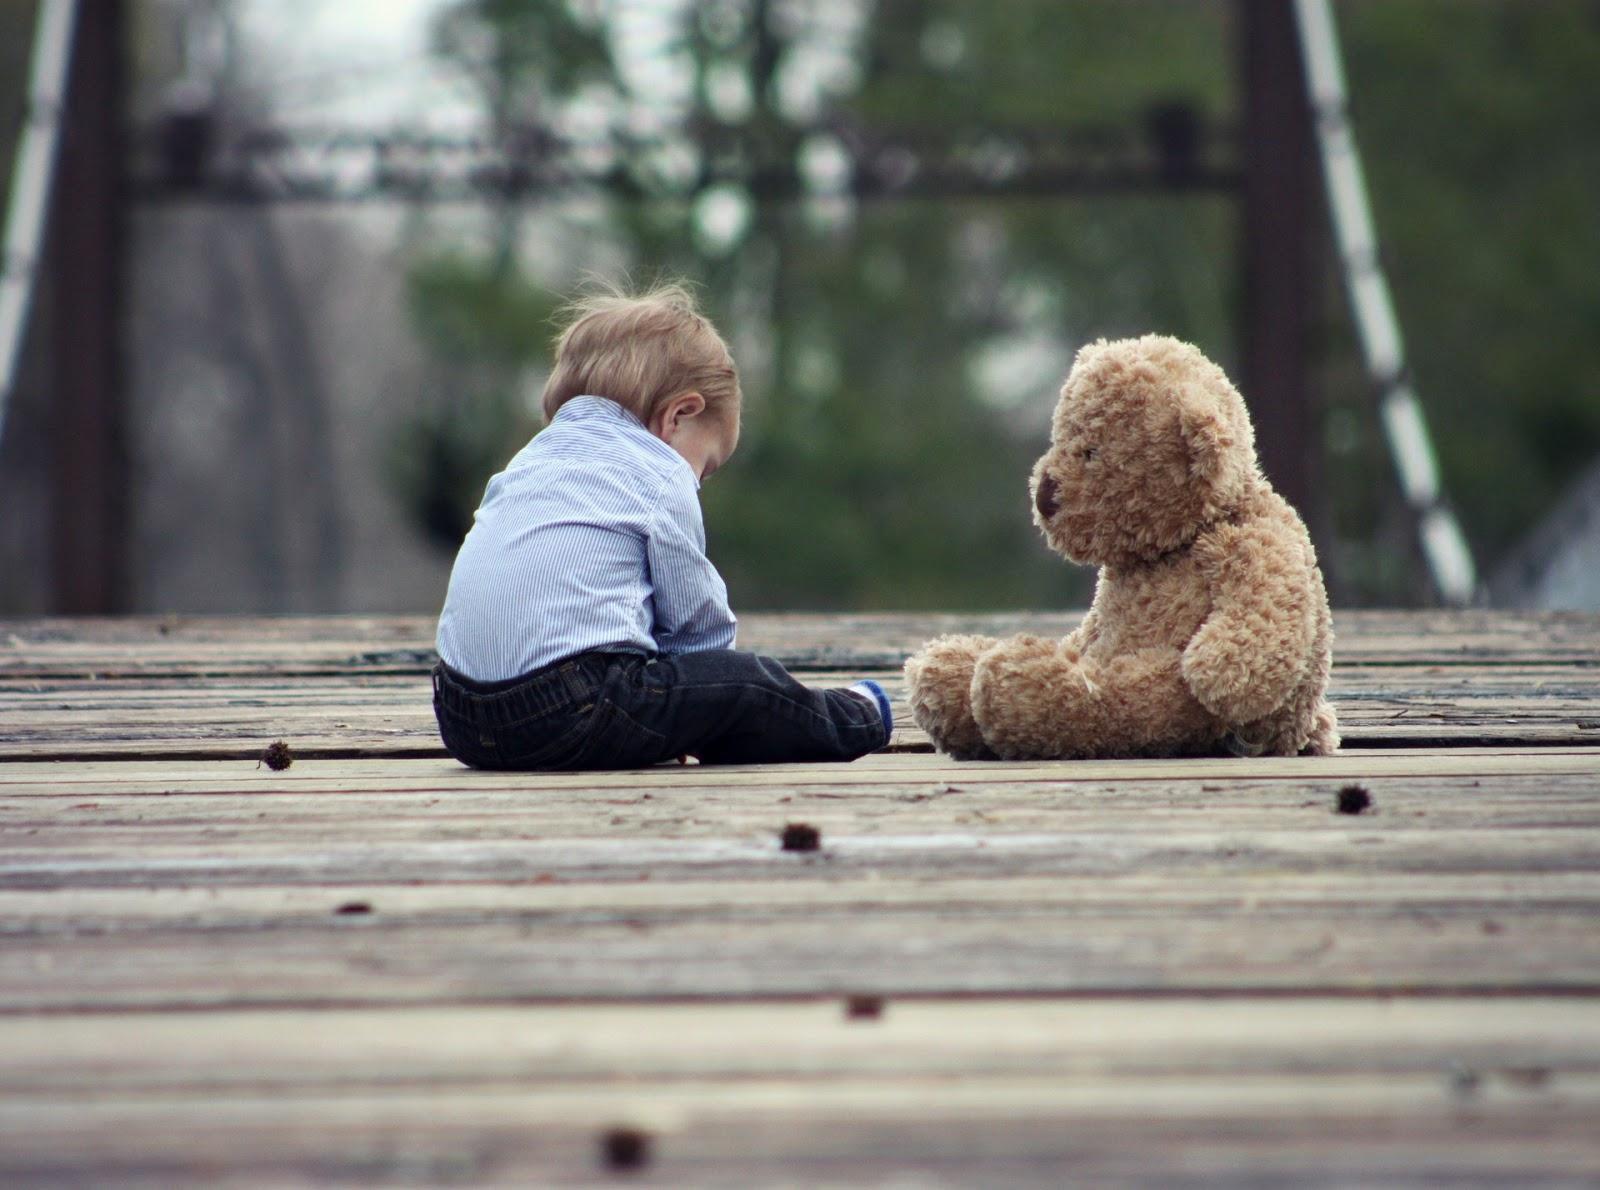 sad child sitting next to teddy bear